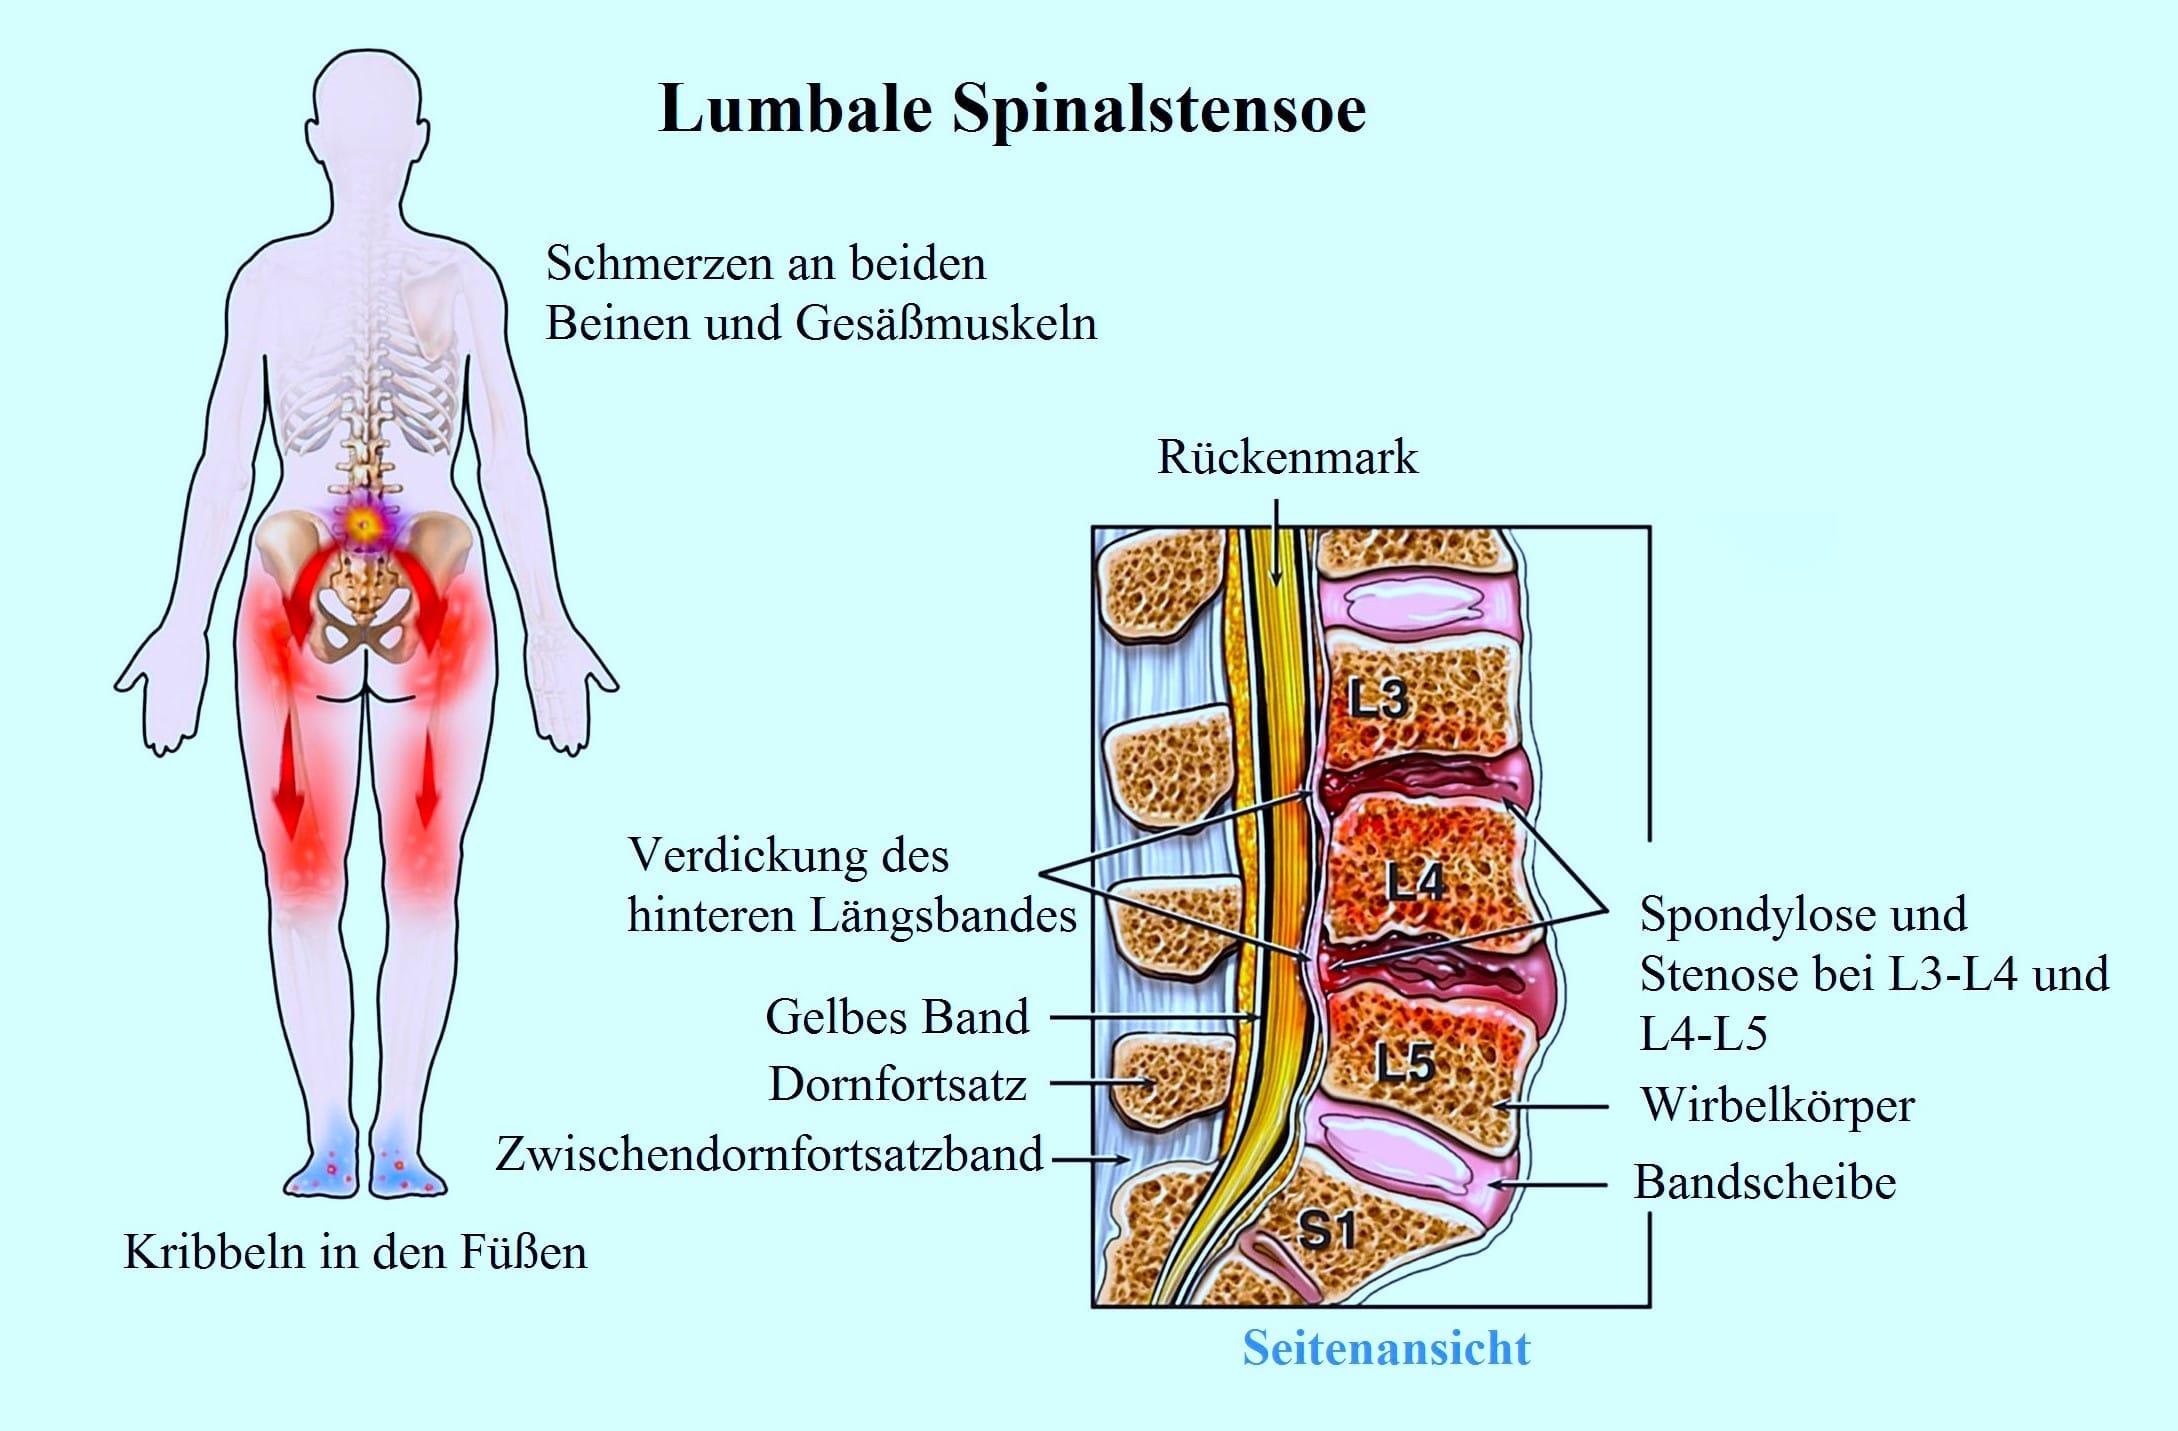 Spondylarthrose, Spondylose, Bandscheibenprotusion, Spinalkanalstenose